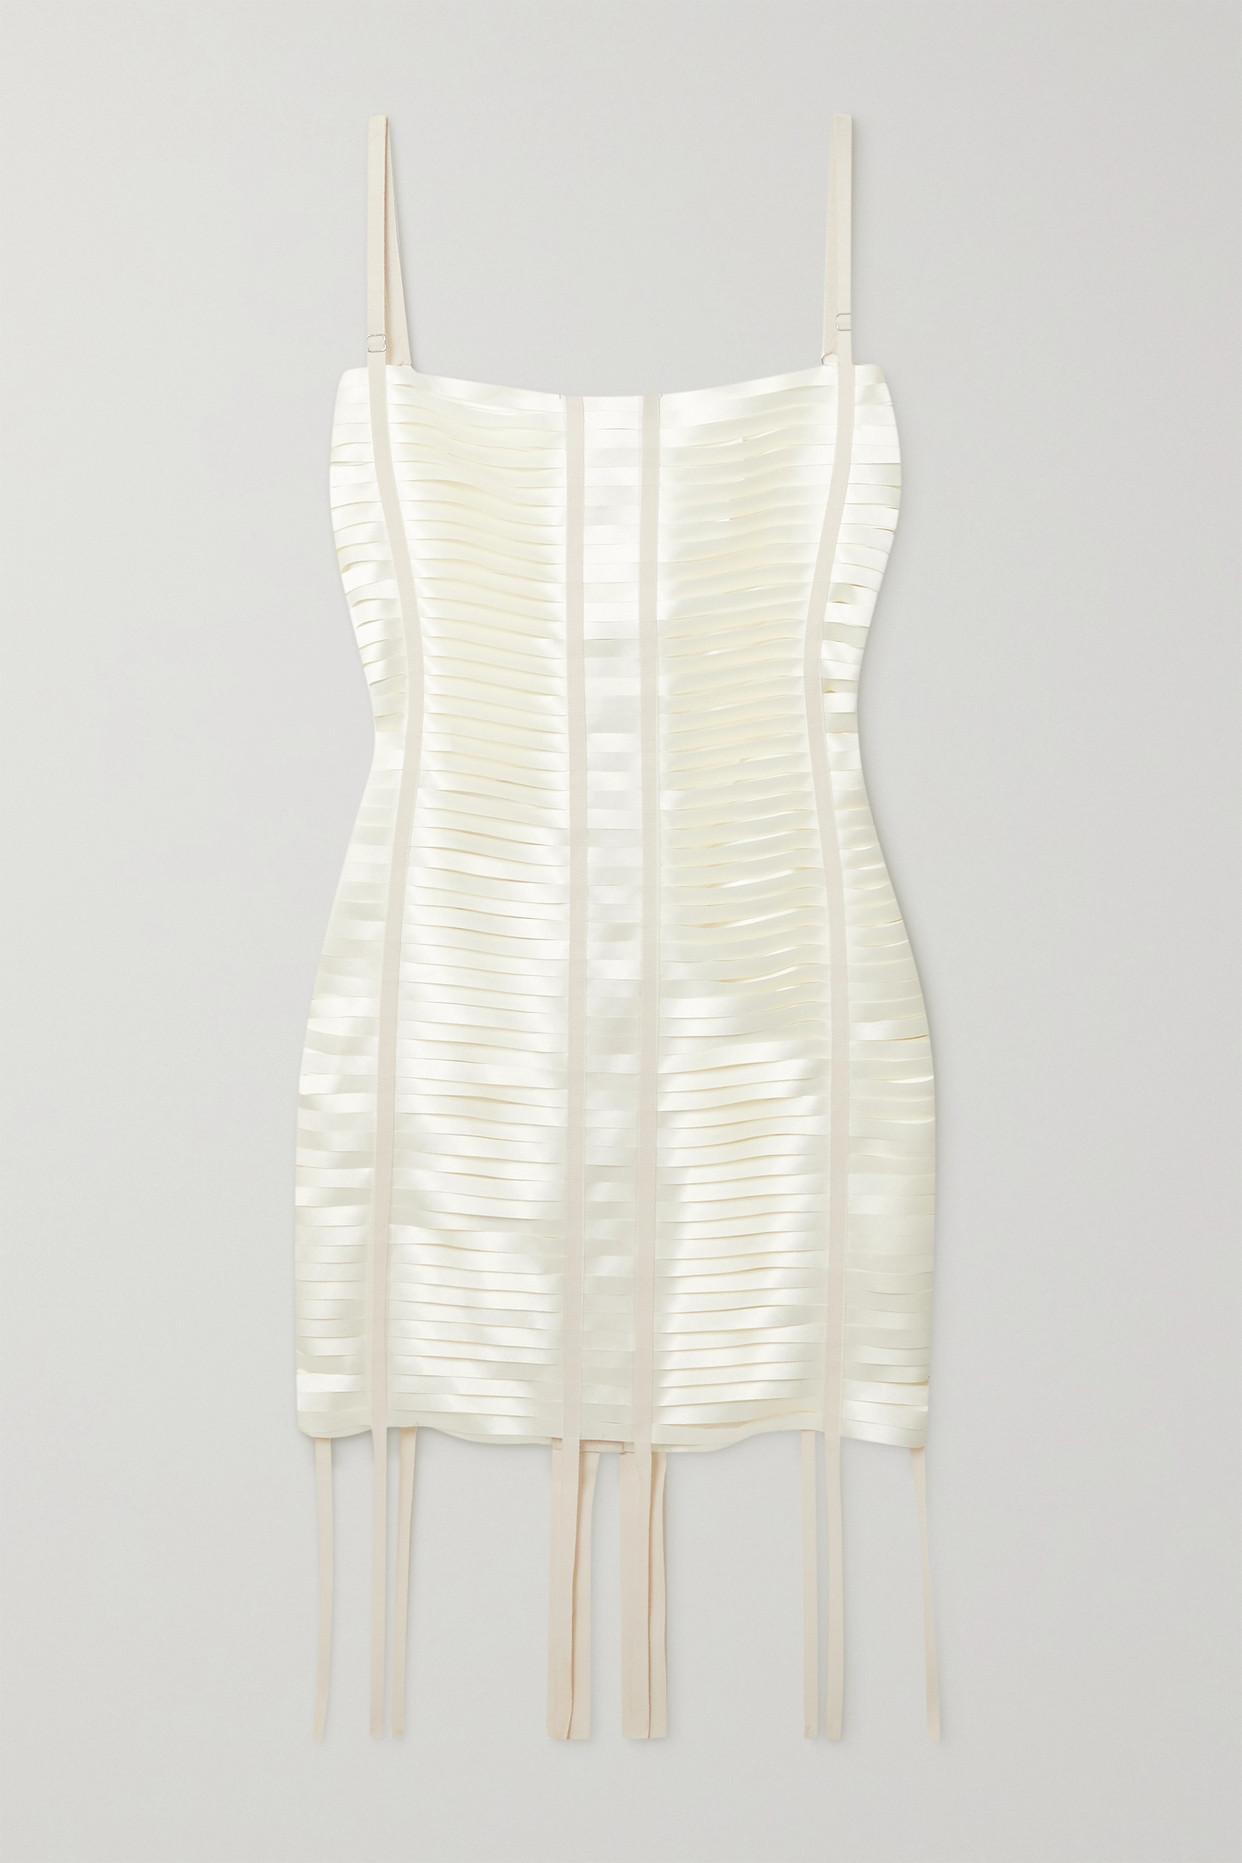 GIVENCHY - Grosgrain-trimmed Cutout Satin Mini Dress - White - FR38